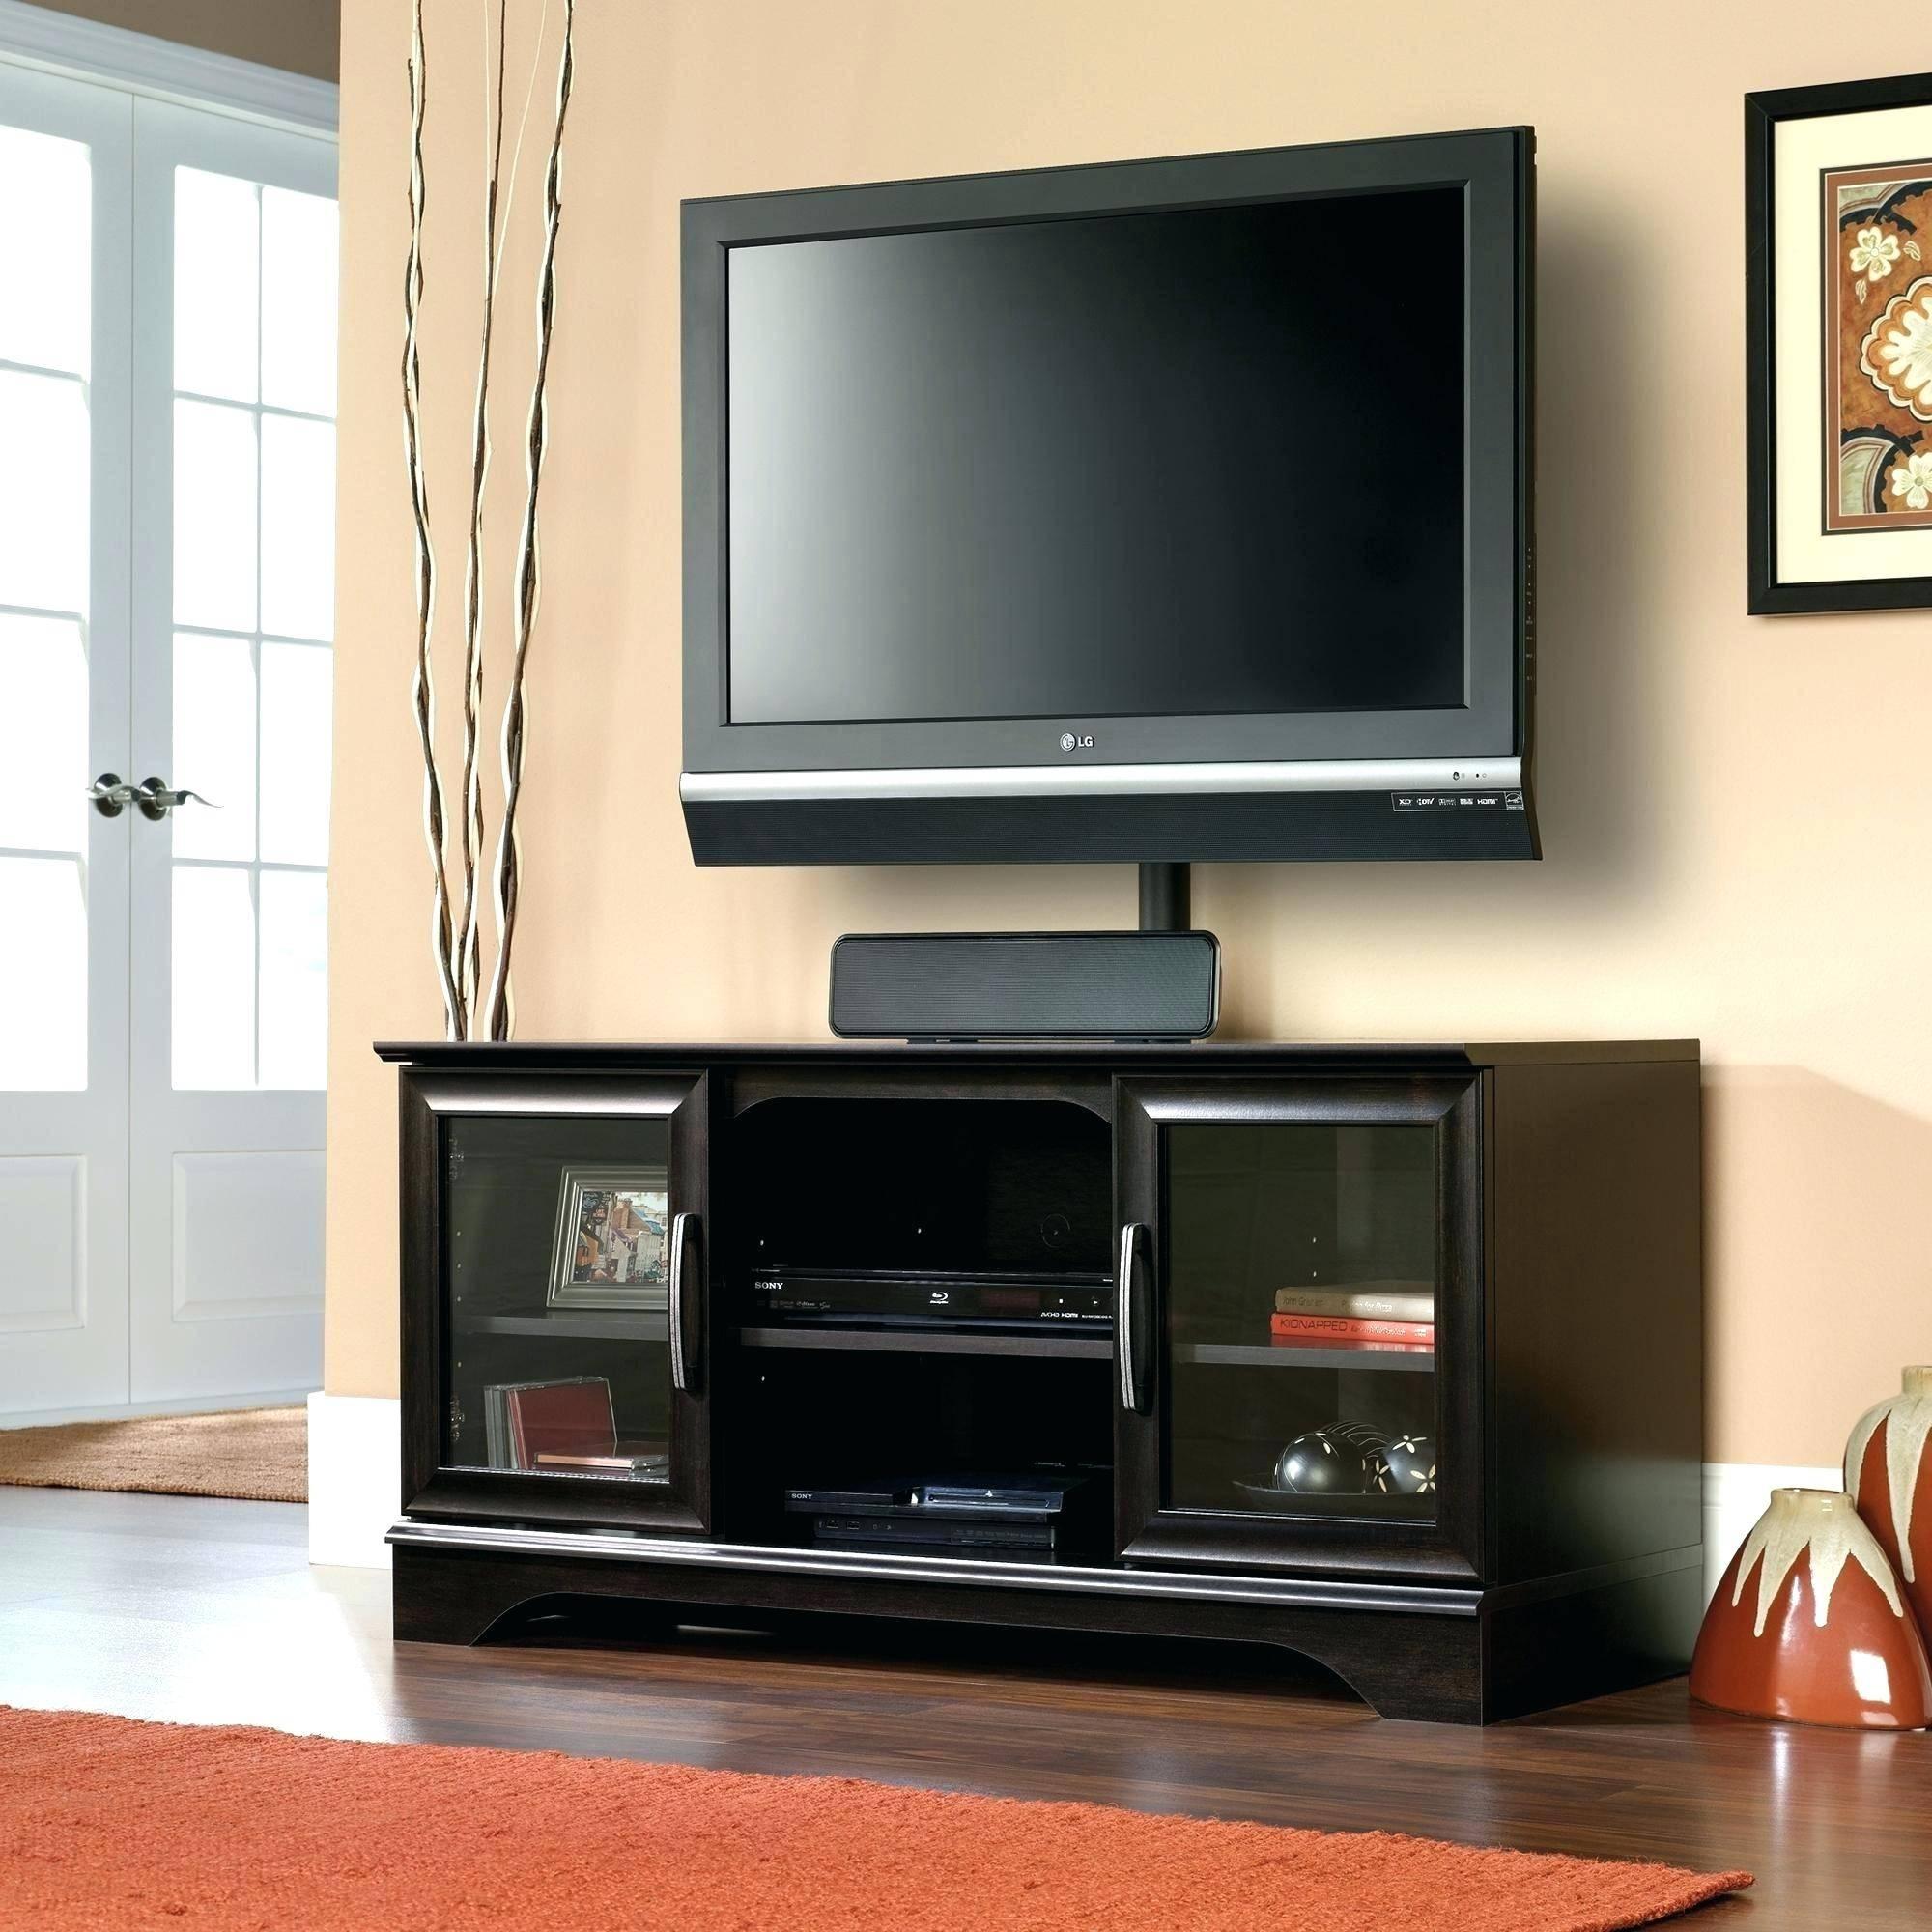 Tv Stand : Trendy Tv Stand With Optional Mountswivel Mount Black Regarding Trendy Tv Stands (View 7 of 15)